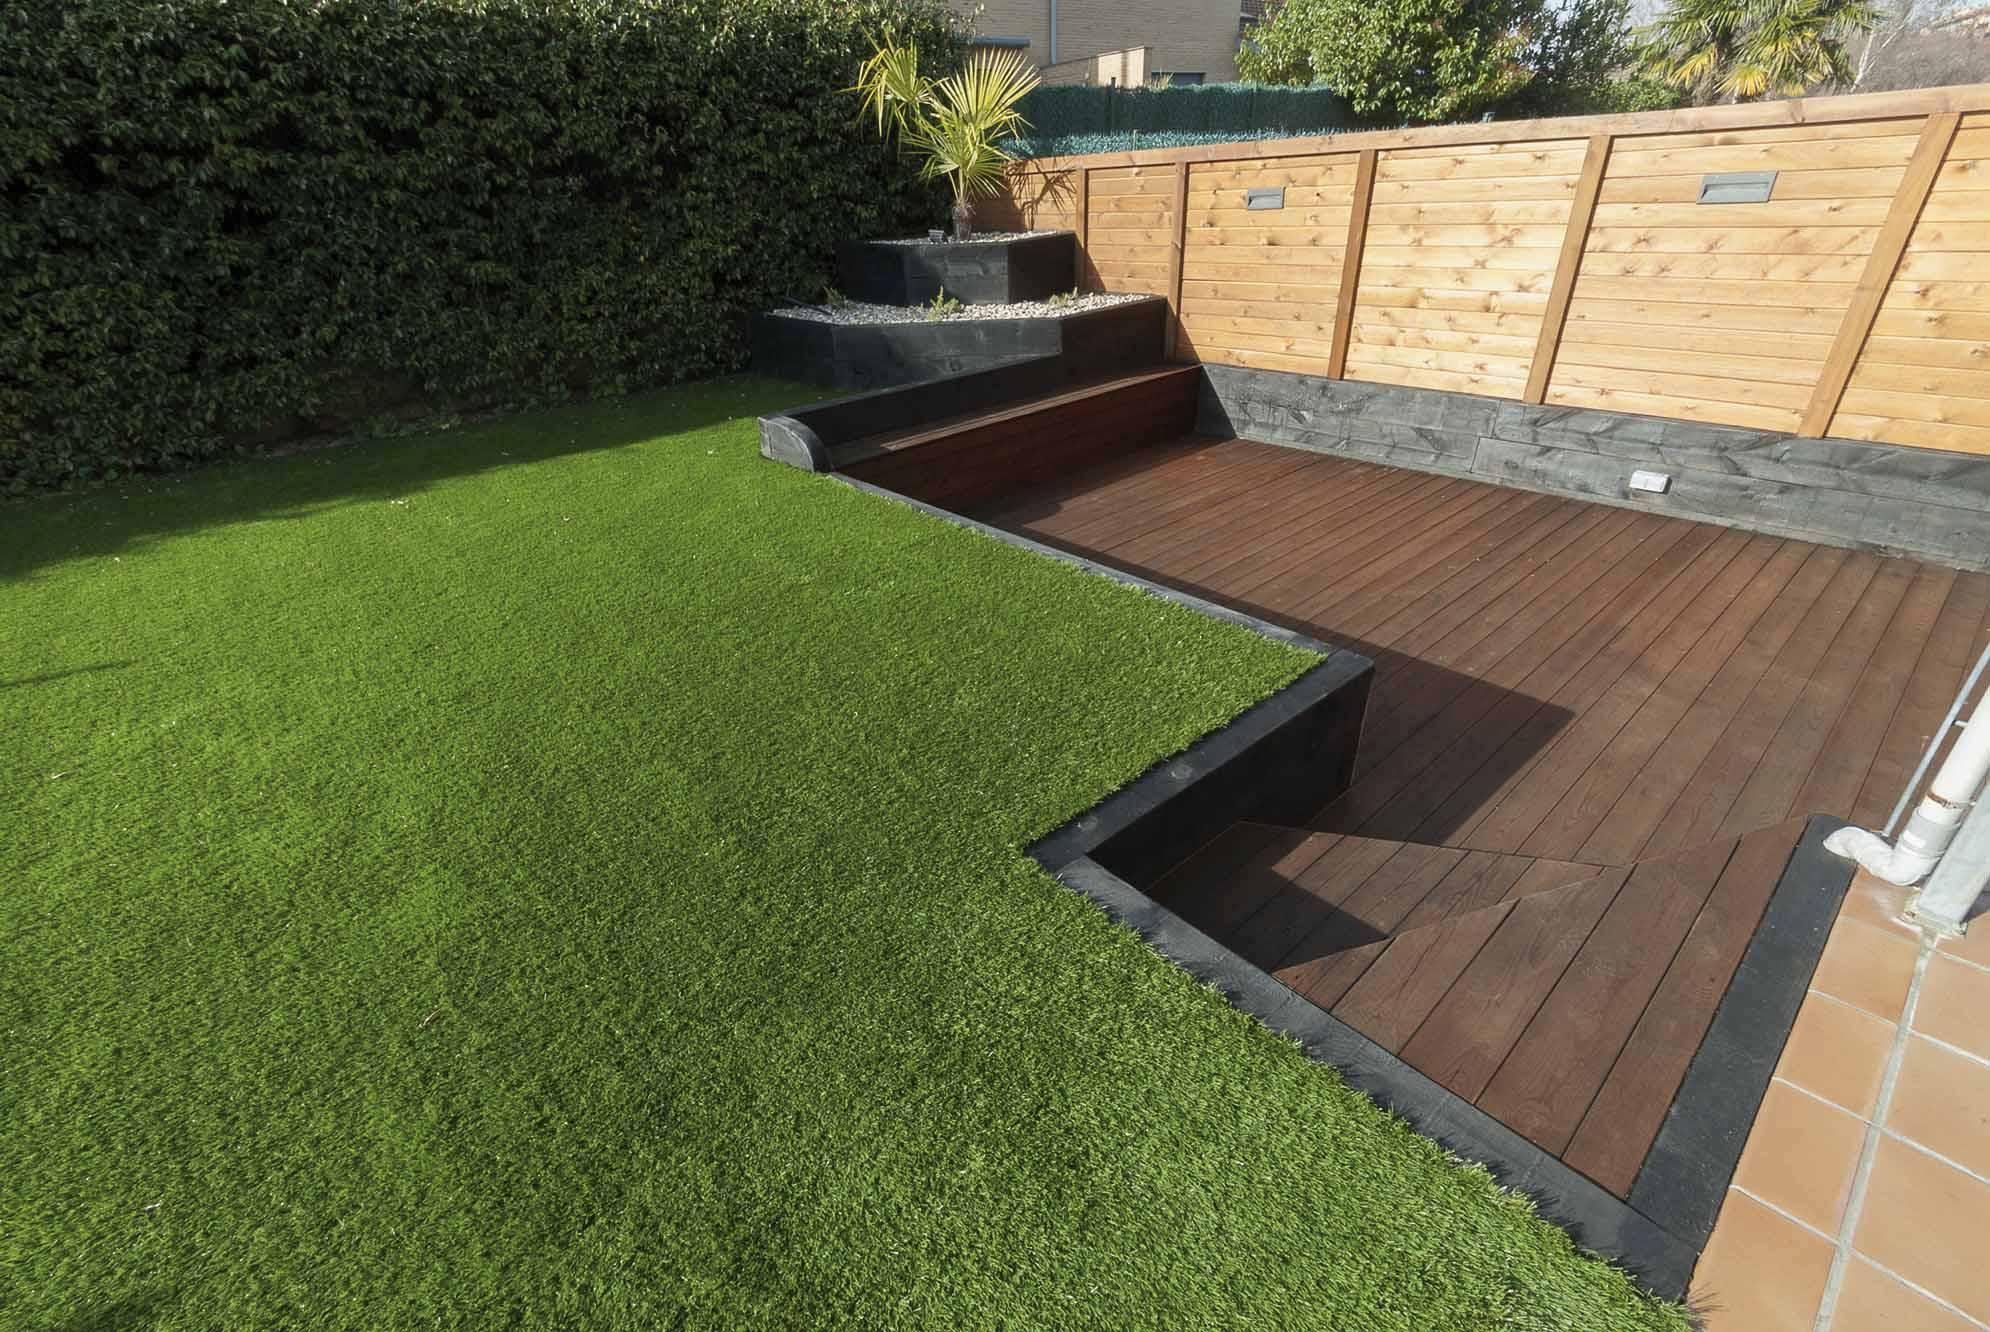 jardin-desnivel-traviesas-madera-1